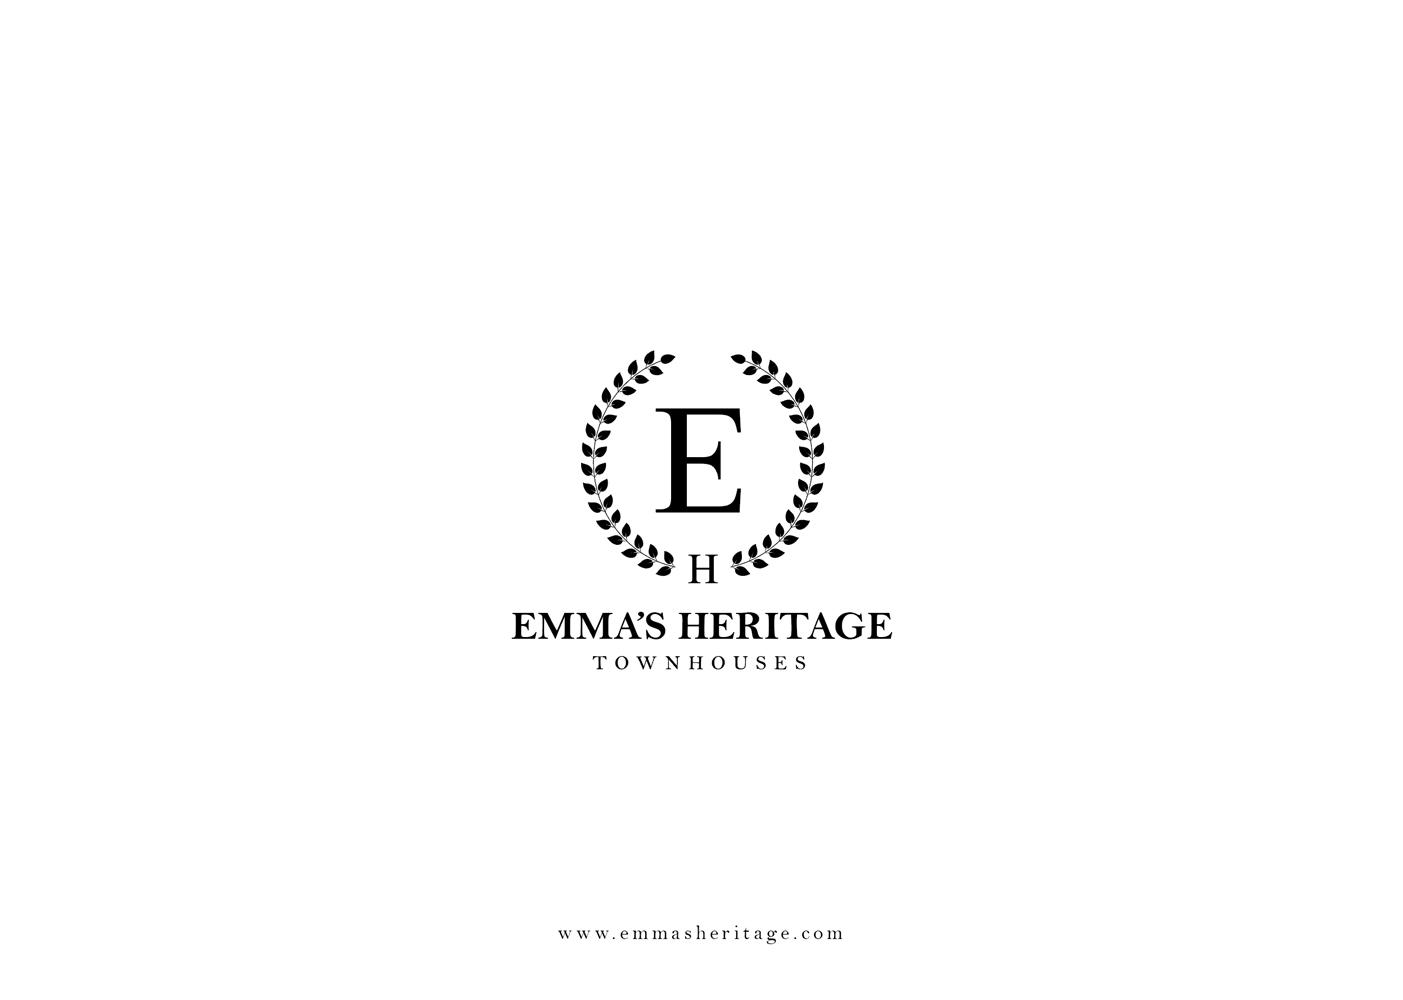 EMMA'S HERITAGE brochure design